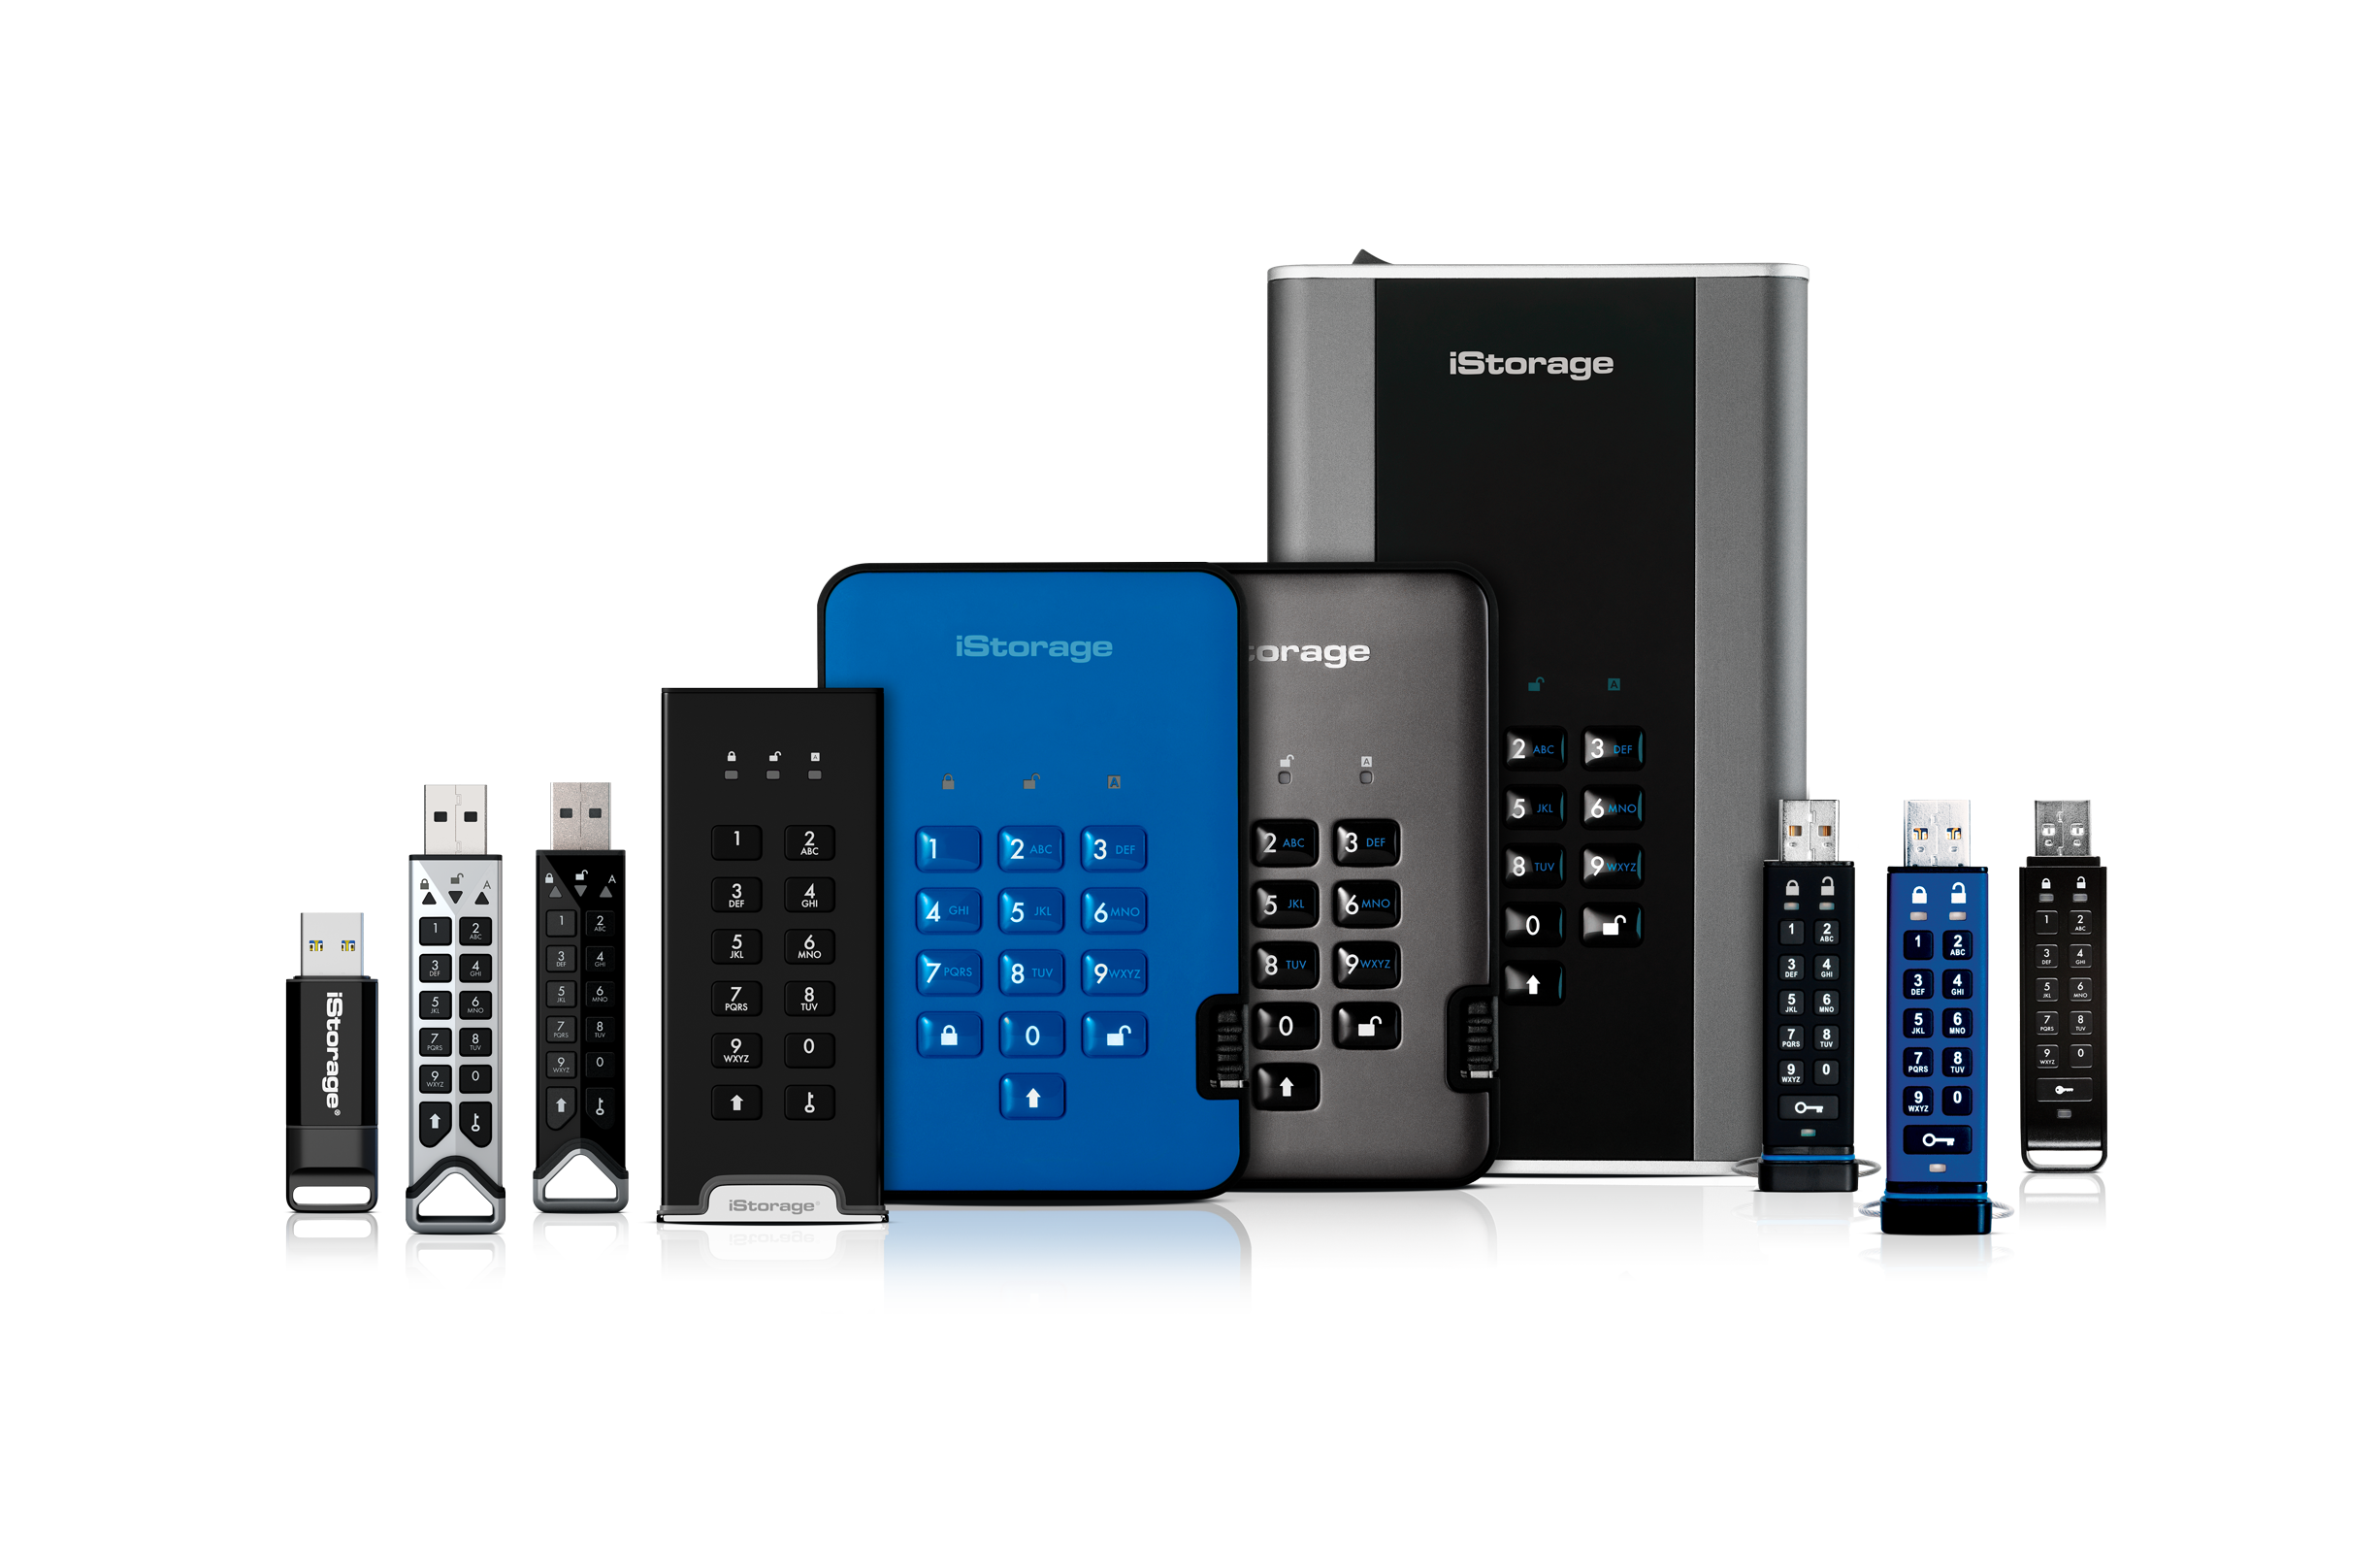 iStorage full product range